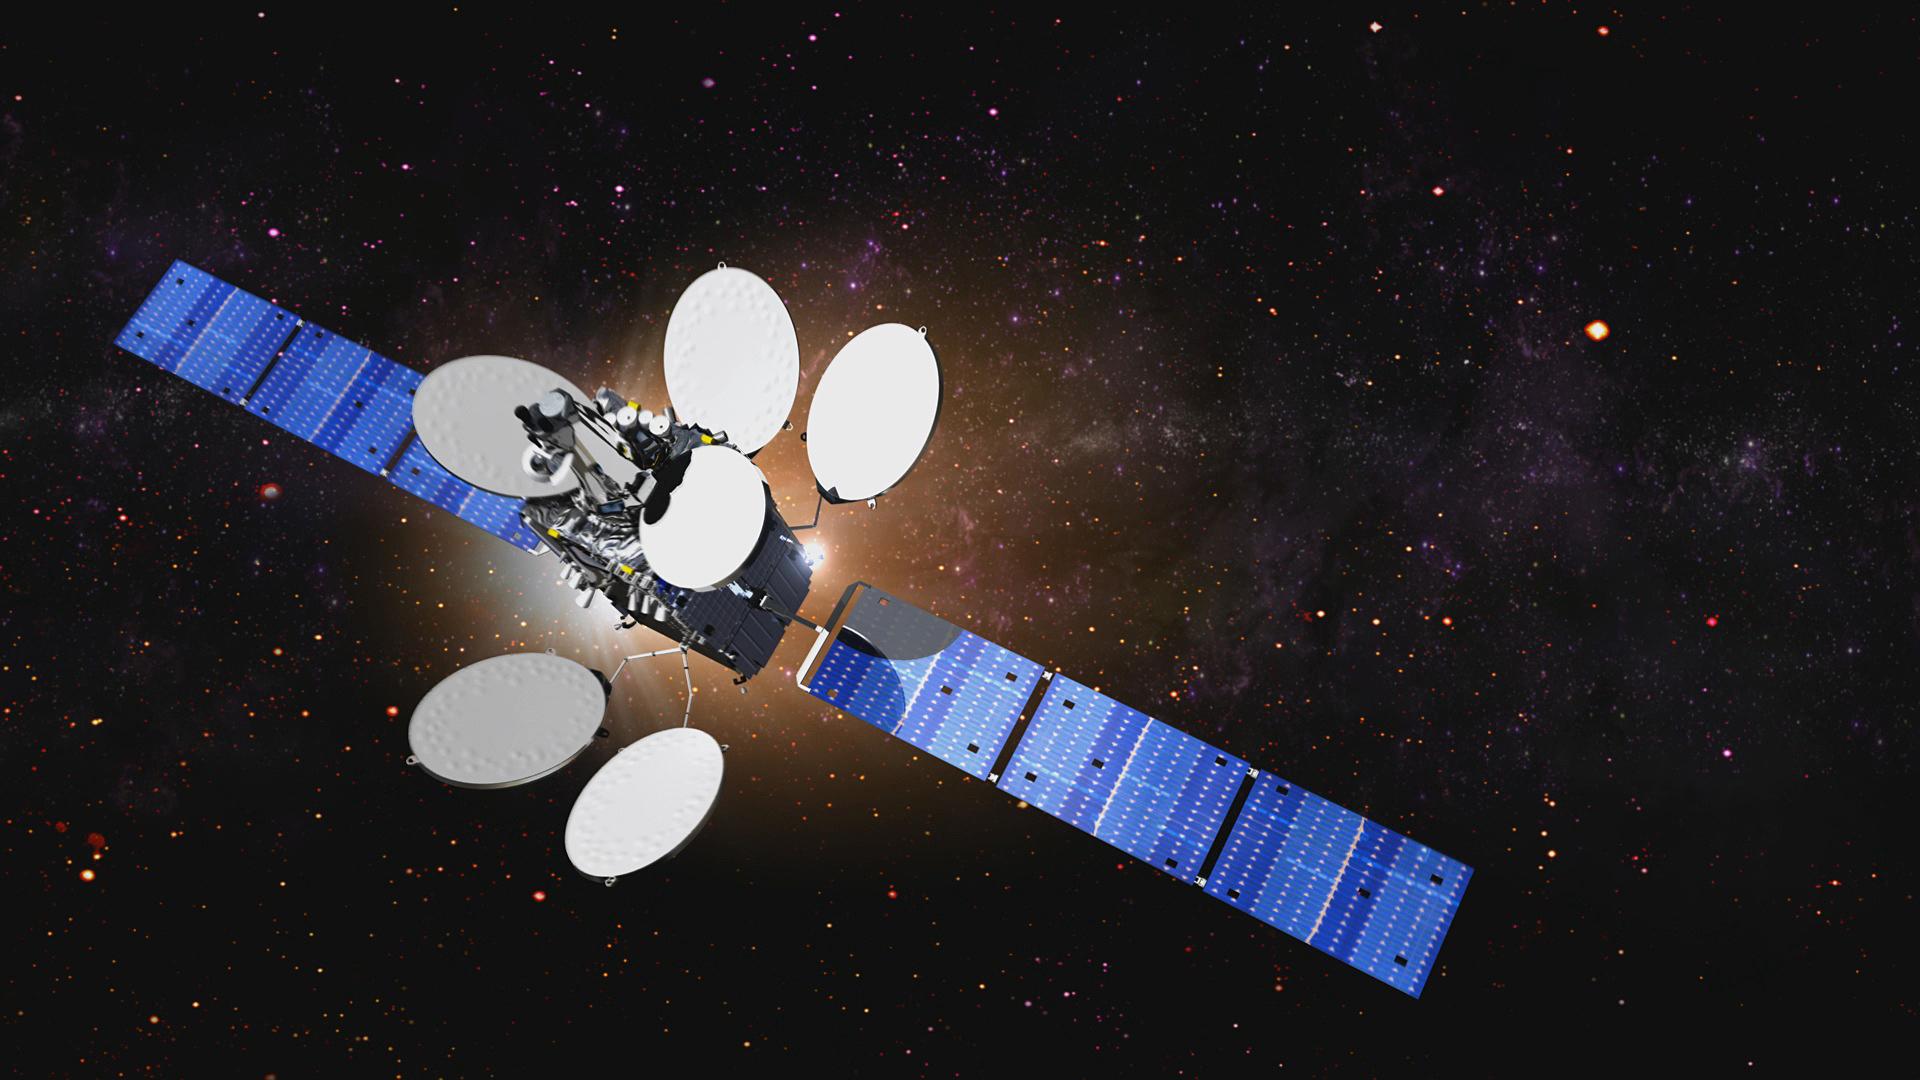 Intelsat 35e satellite